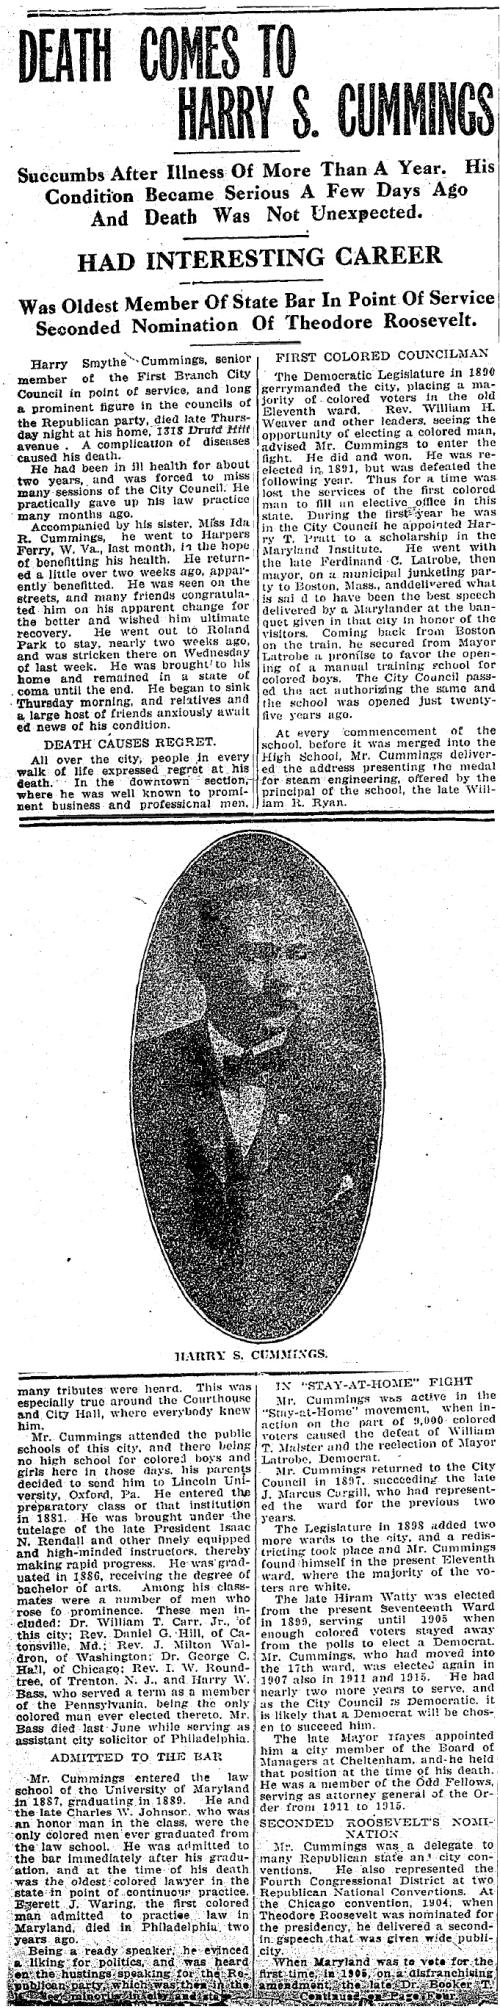 Baltimore Afro-American_1917-9-8_p1